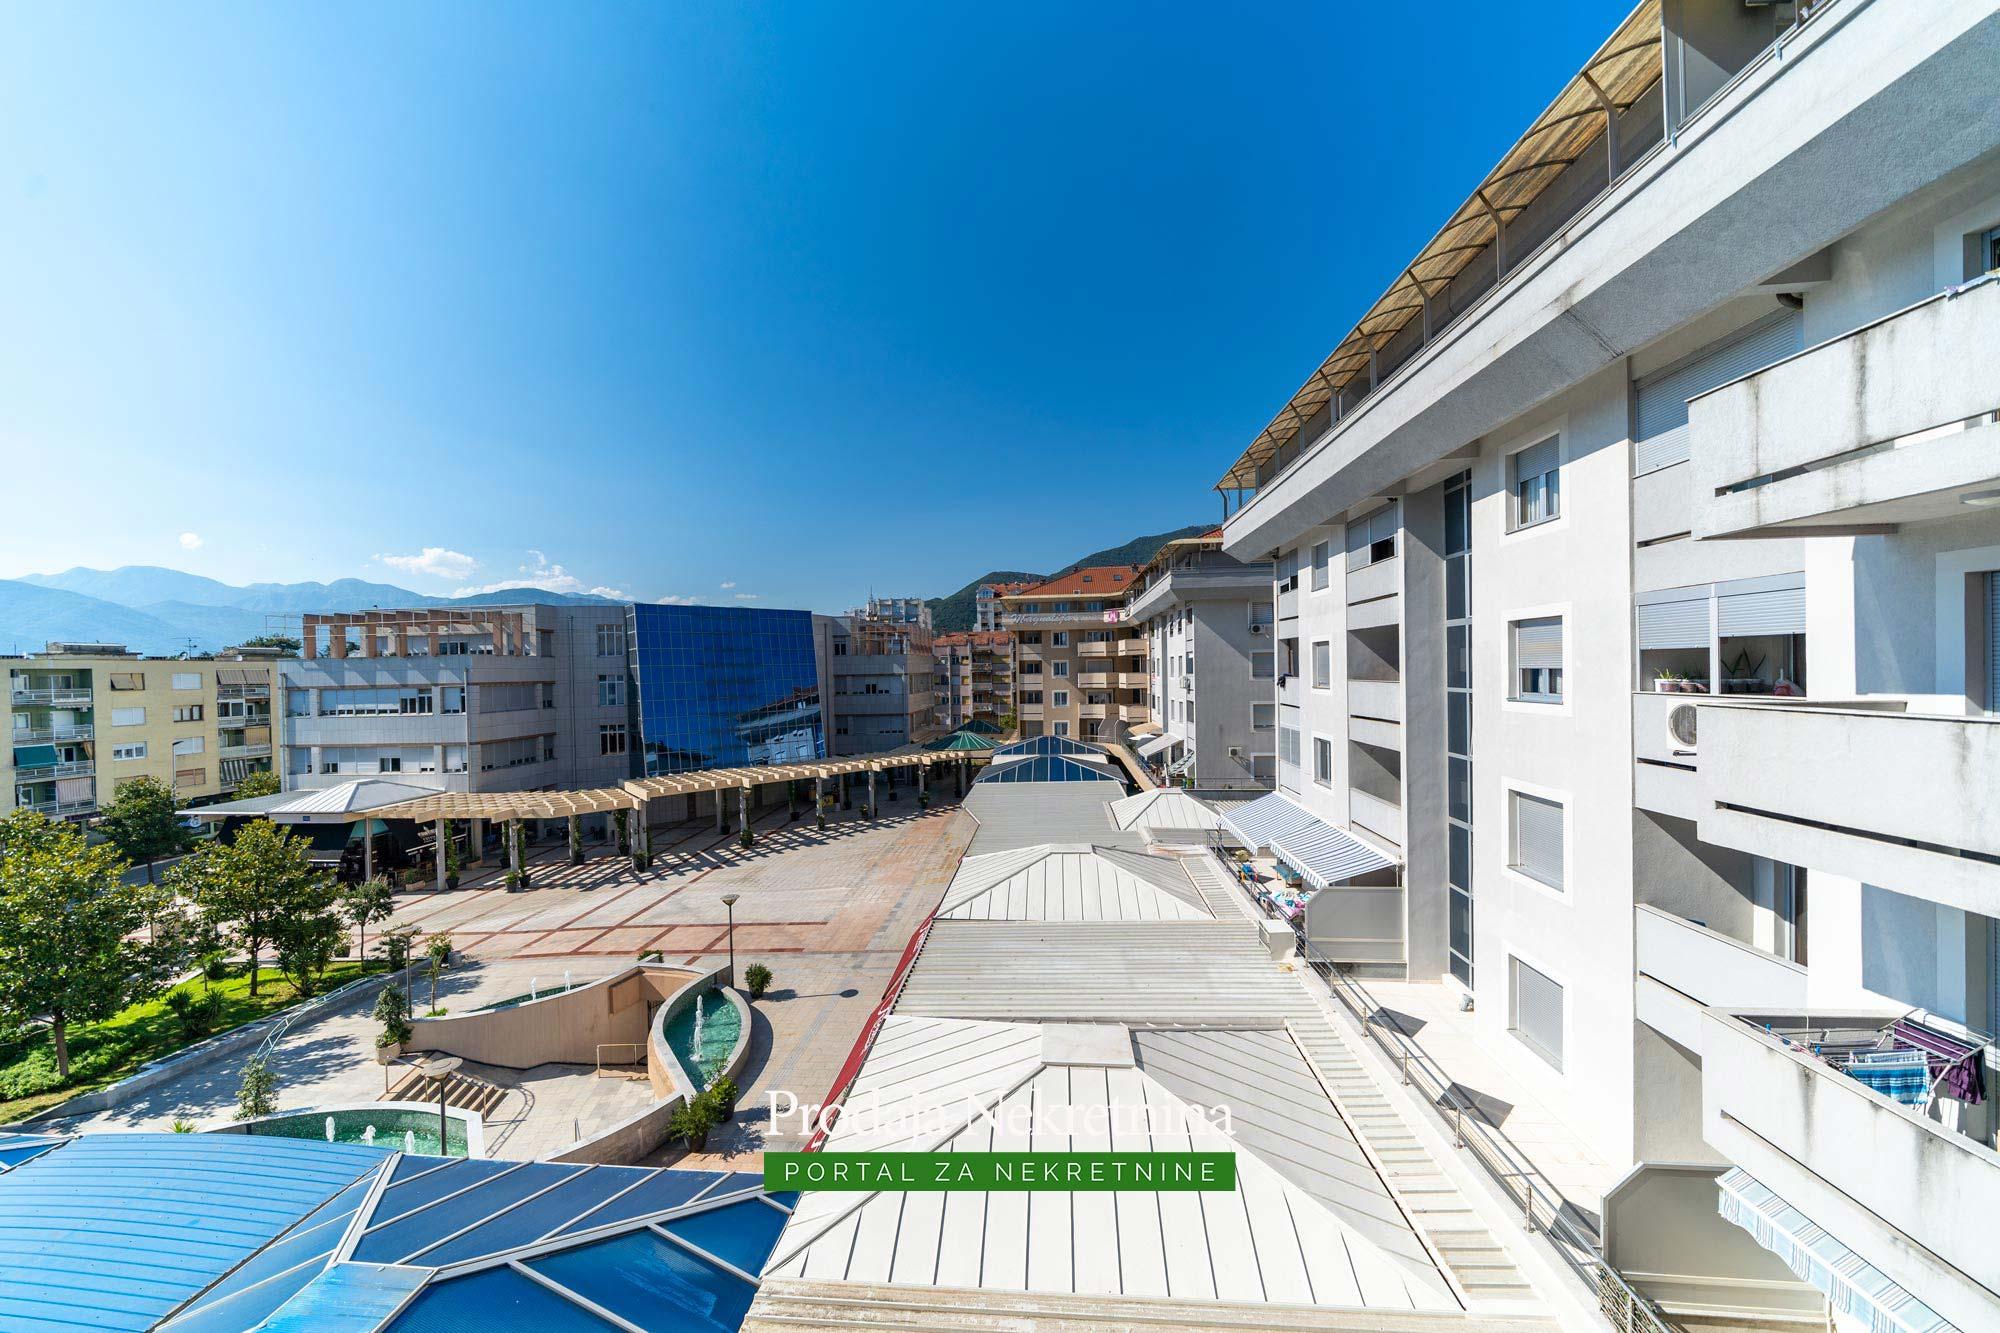 Penthouse u blizini Porto Montenegro | Prodaja nekretnina